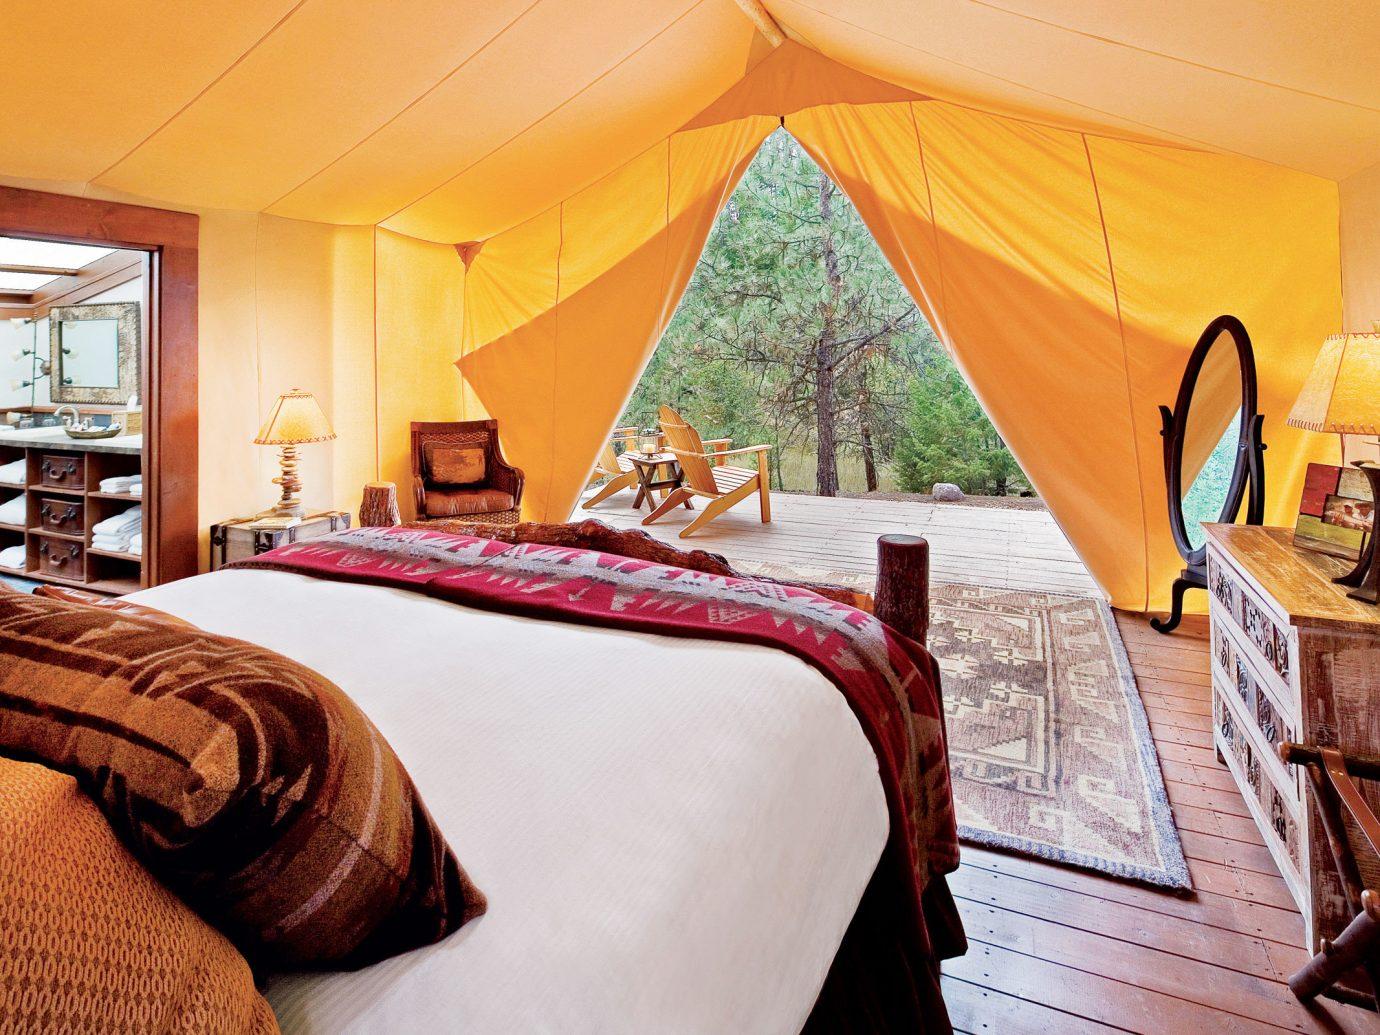 Glamping Hotels Luxury Travel Outdoors + Adventure Trip Ideas indoor room bed Suite Bedroom estate Resort interior design hotel bed sheet cottage furniture